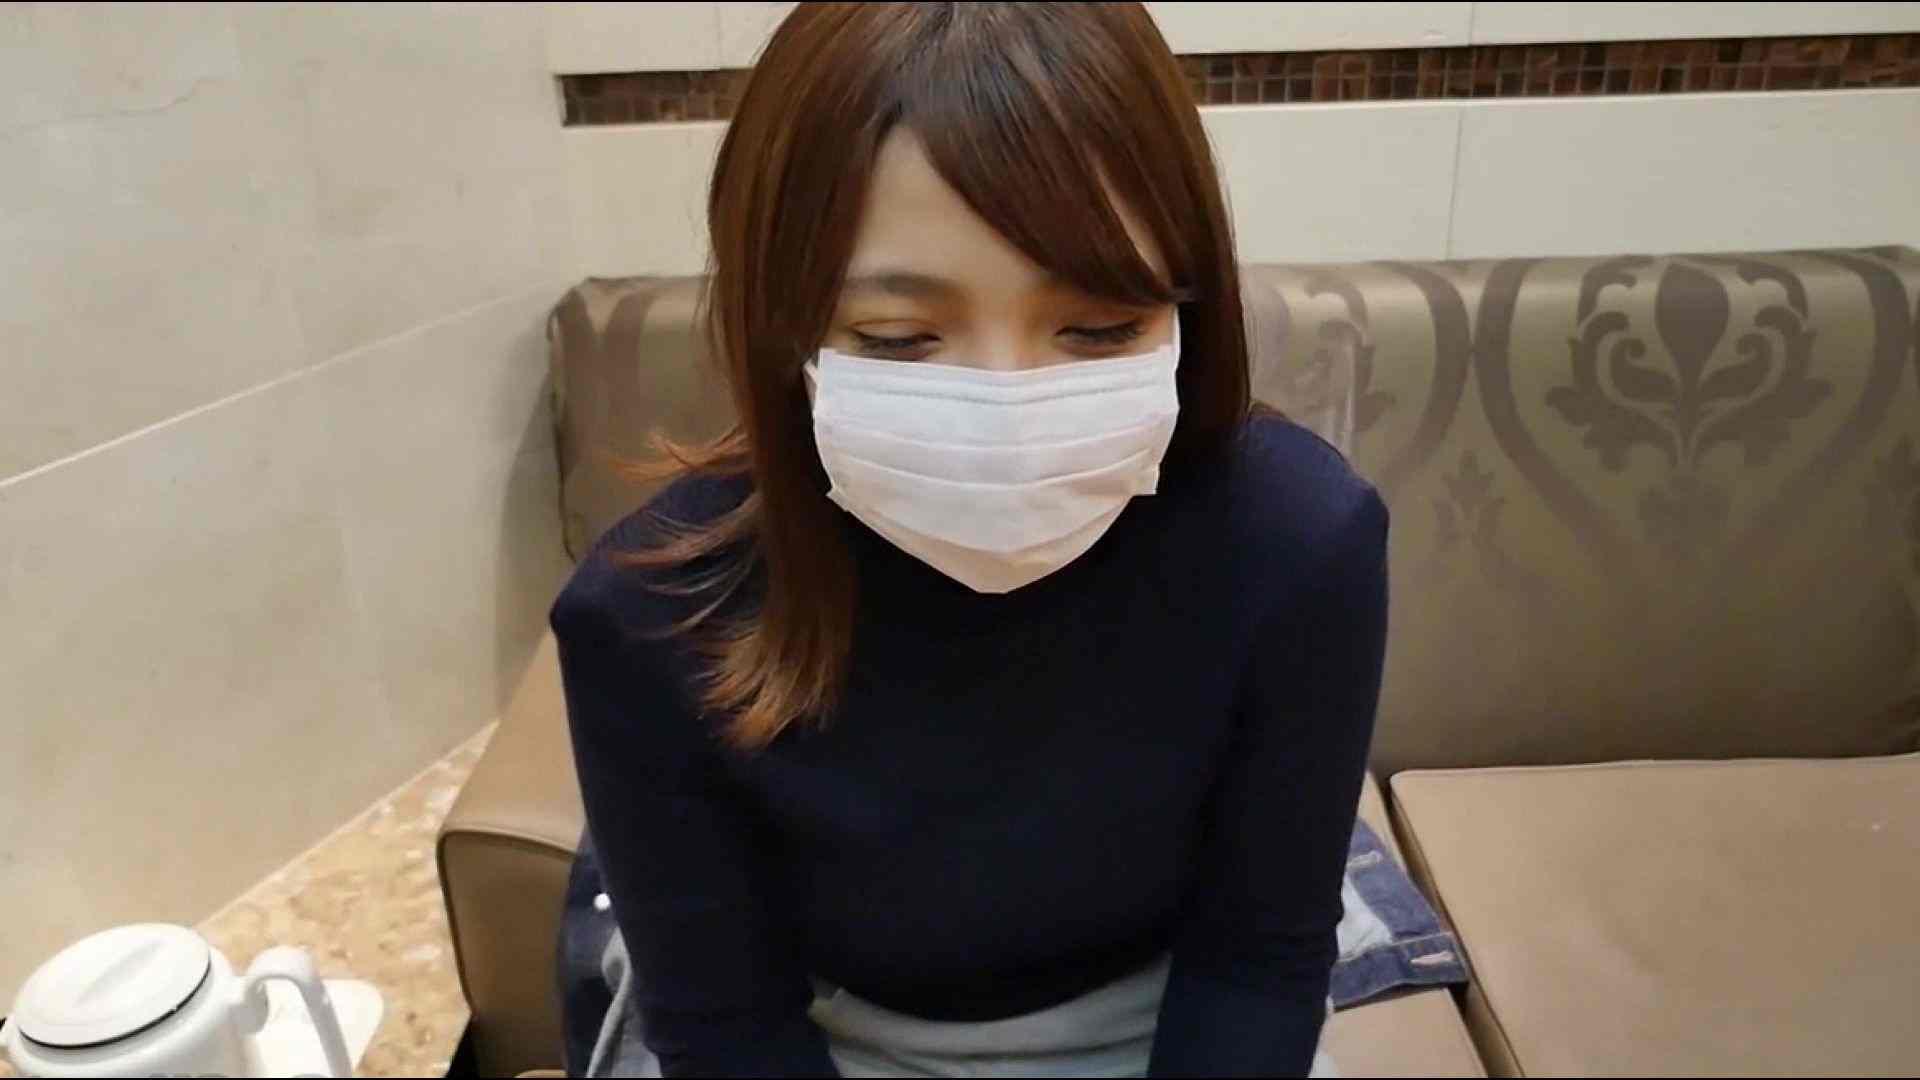 S級厳選美女ビッチガールVol.41 前編 OL女体  105連発 40